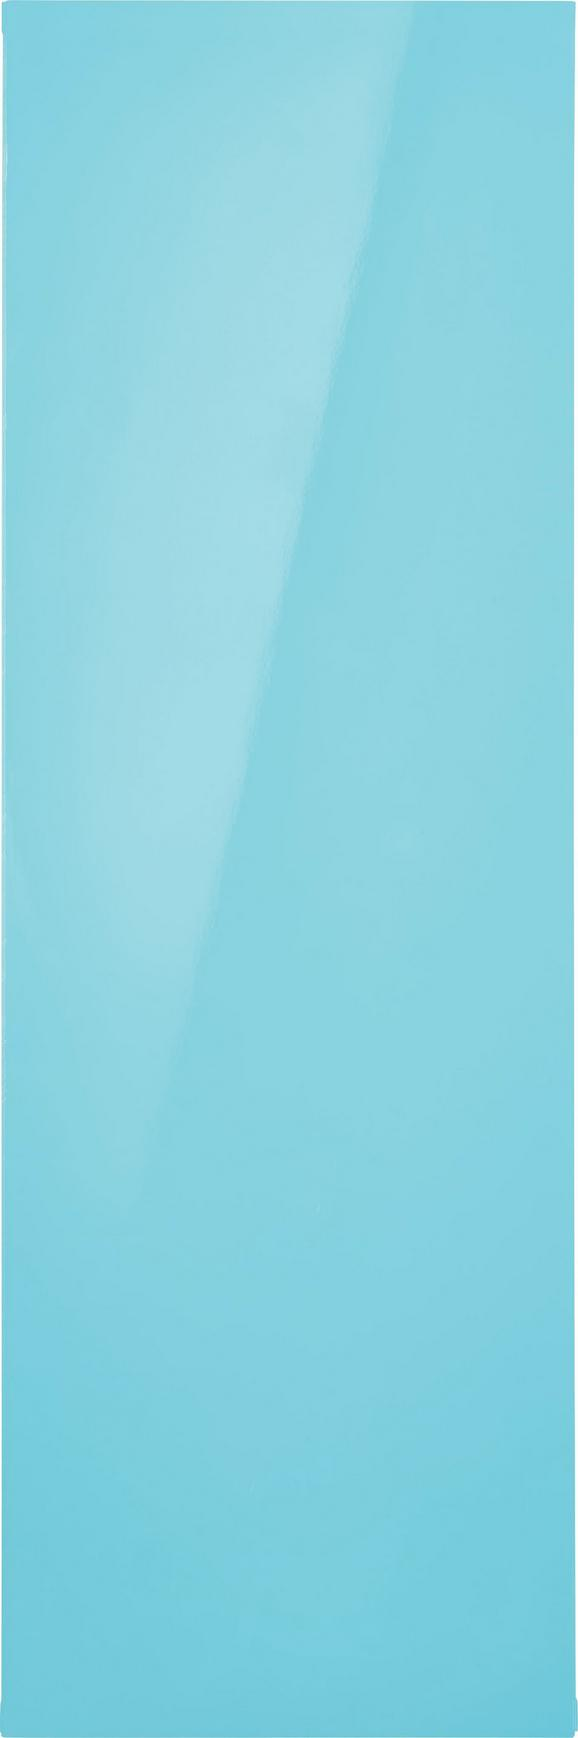 Hängeschrank Hellblau Hochglanz - Hellblau, MODERN, Holzwerkstoff (90/30/34cm) - Mömax modern living